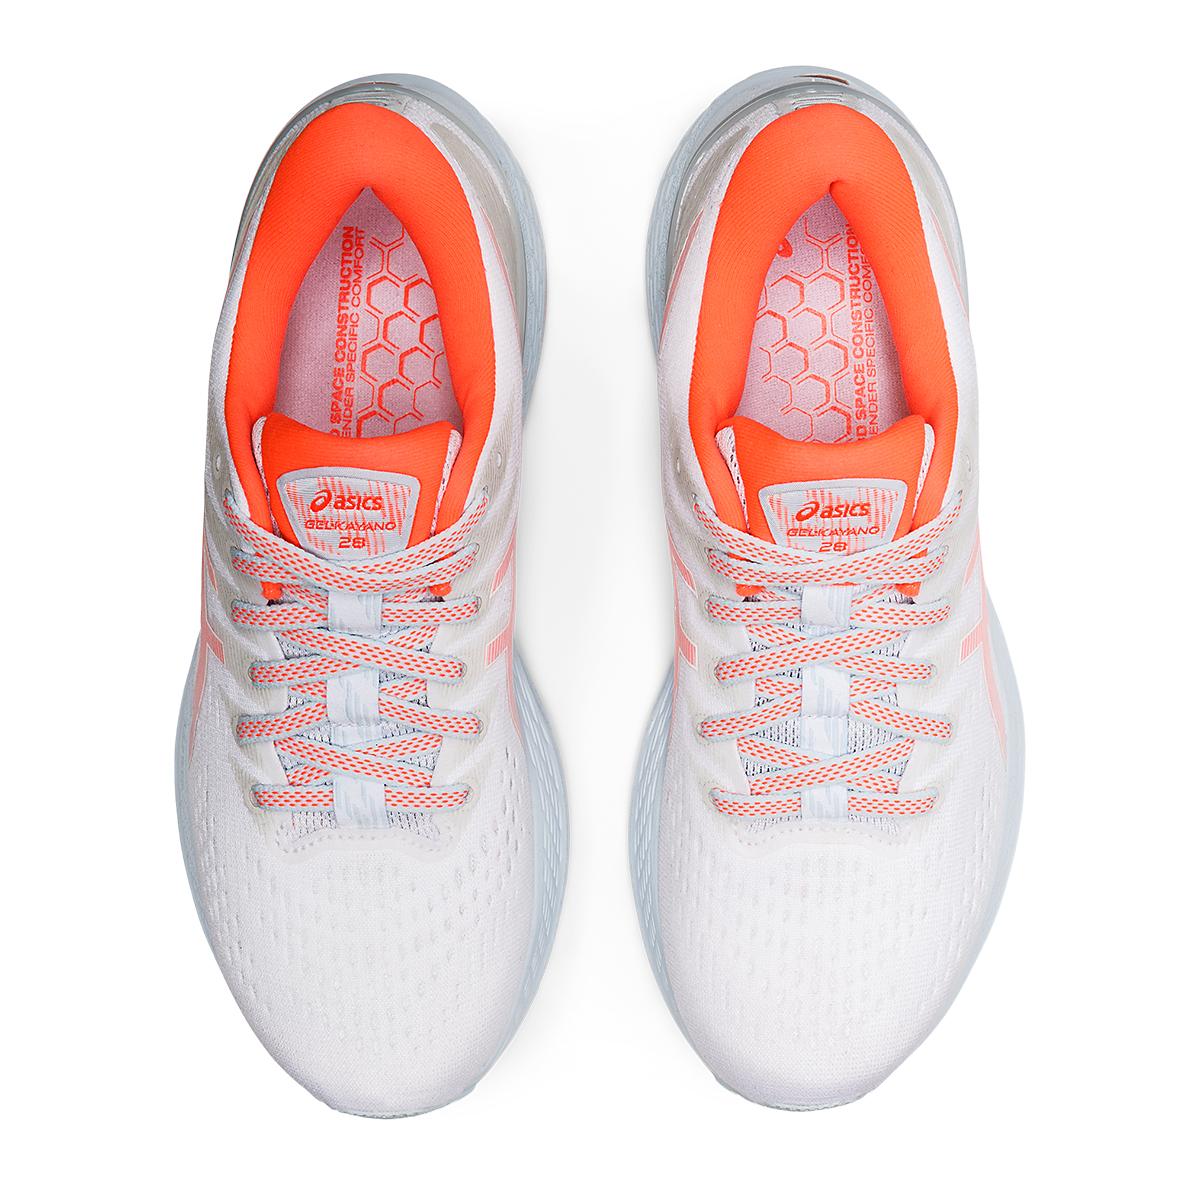 Women's Asics Gel-Kayano 28 Running Shoe - Color: White/Flash Coral - JackRabbit Exclusive - Size: 5 - Width: Regular, White/Flash Coral - JackRabbit Exclusive, large, image 6